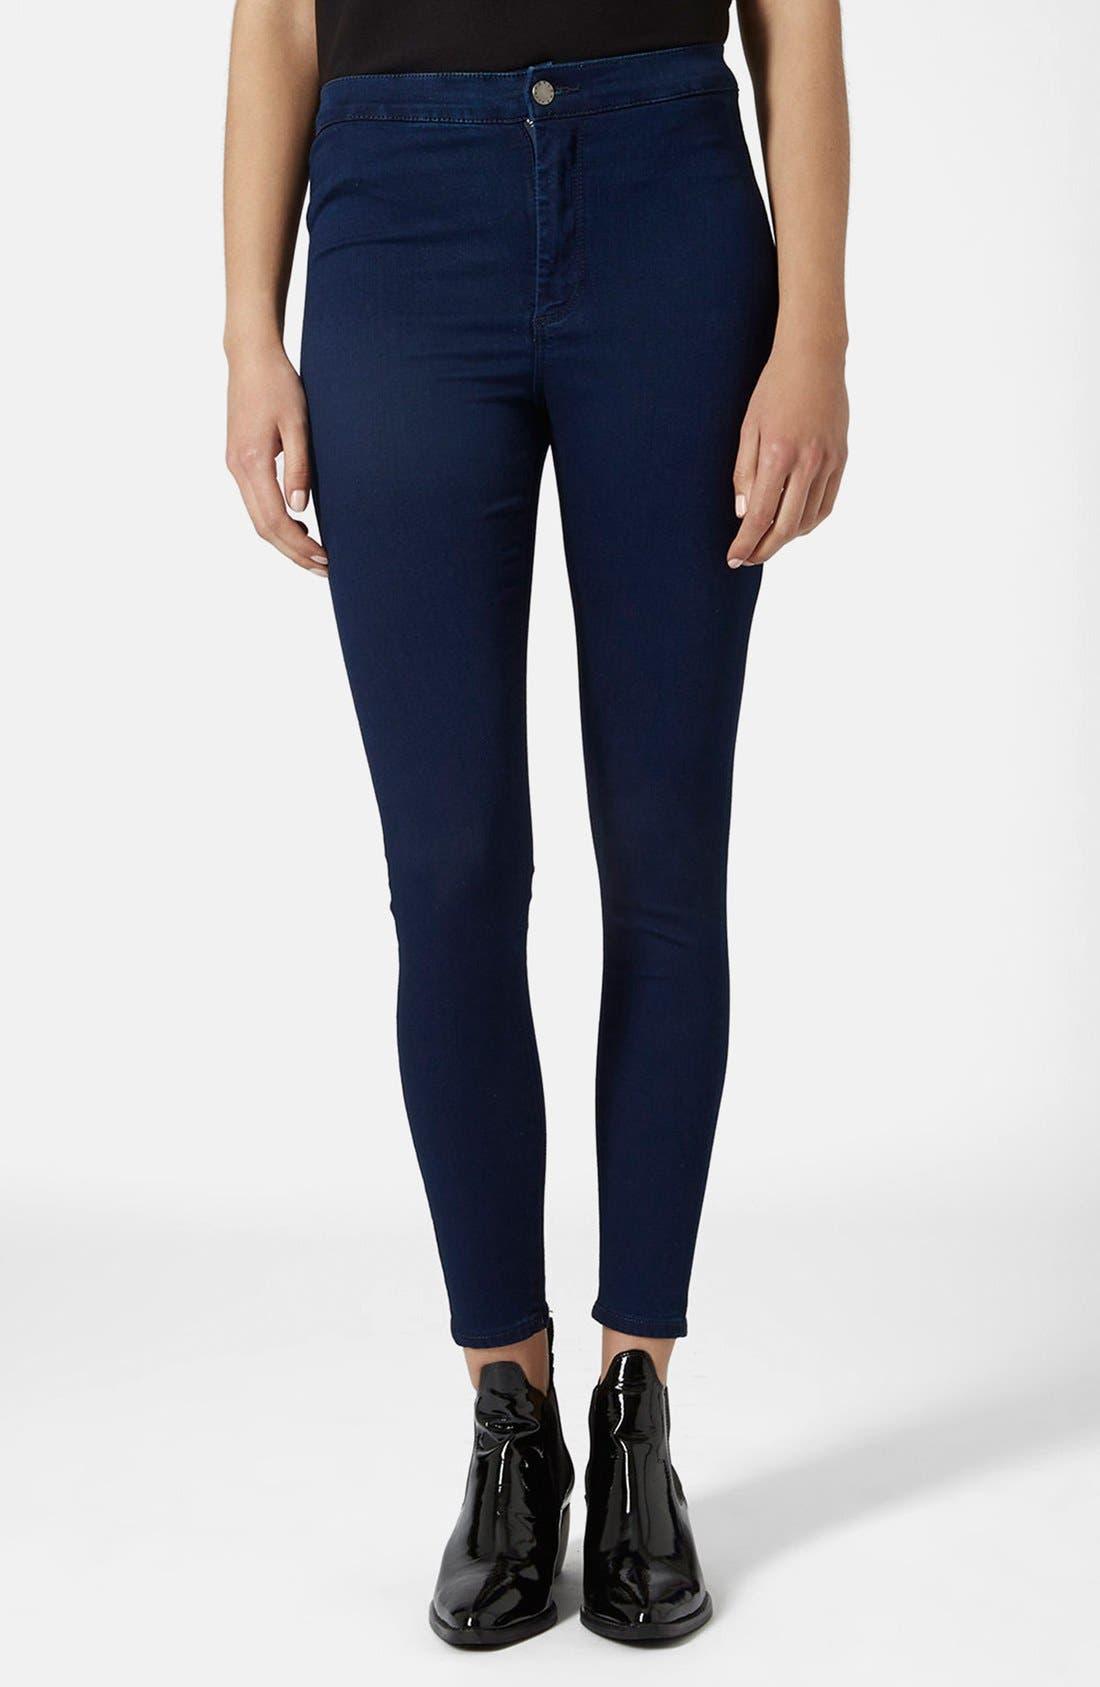 Alternate Image 1 Selected - Topshop Moto 'Joni' High Rise Jeans (Blue) (Petite)